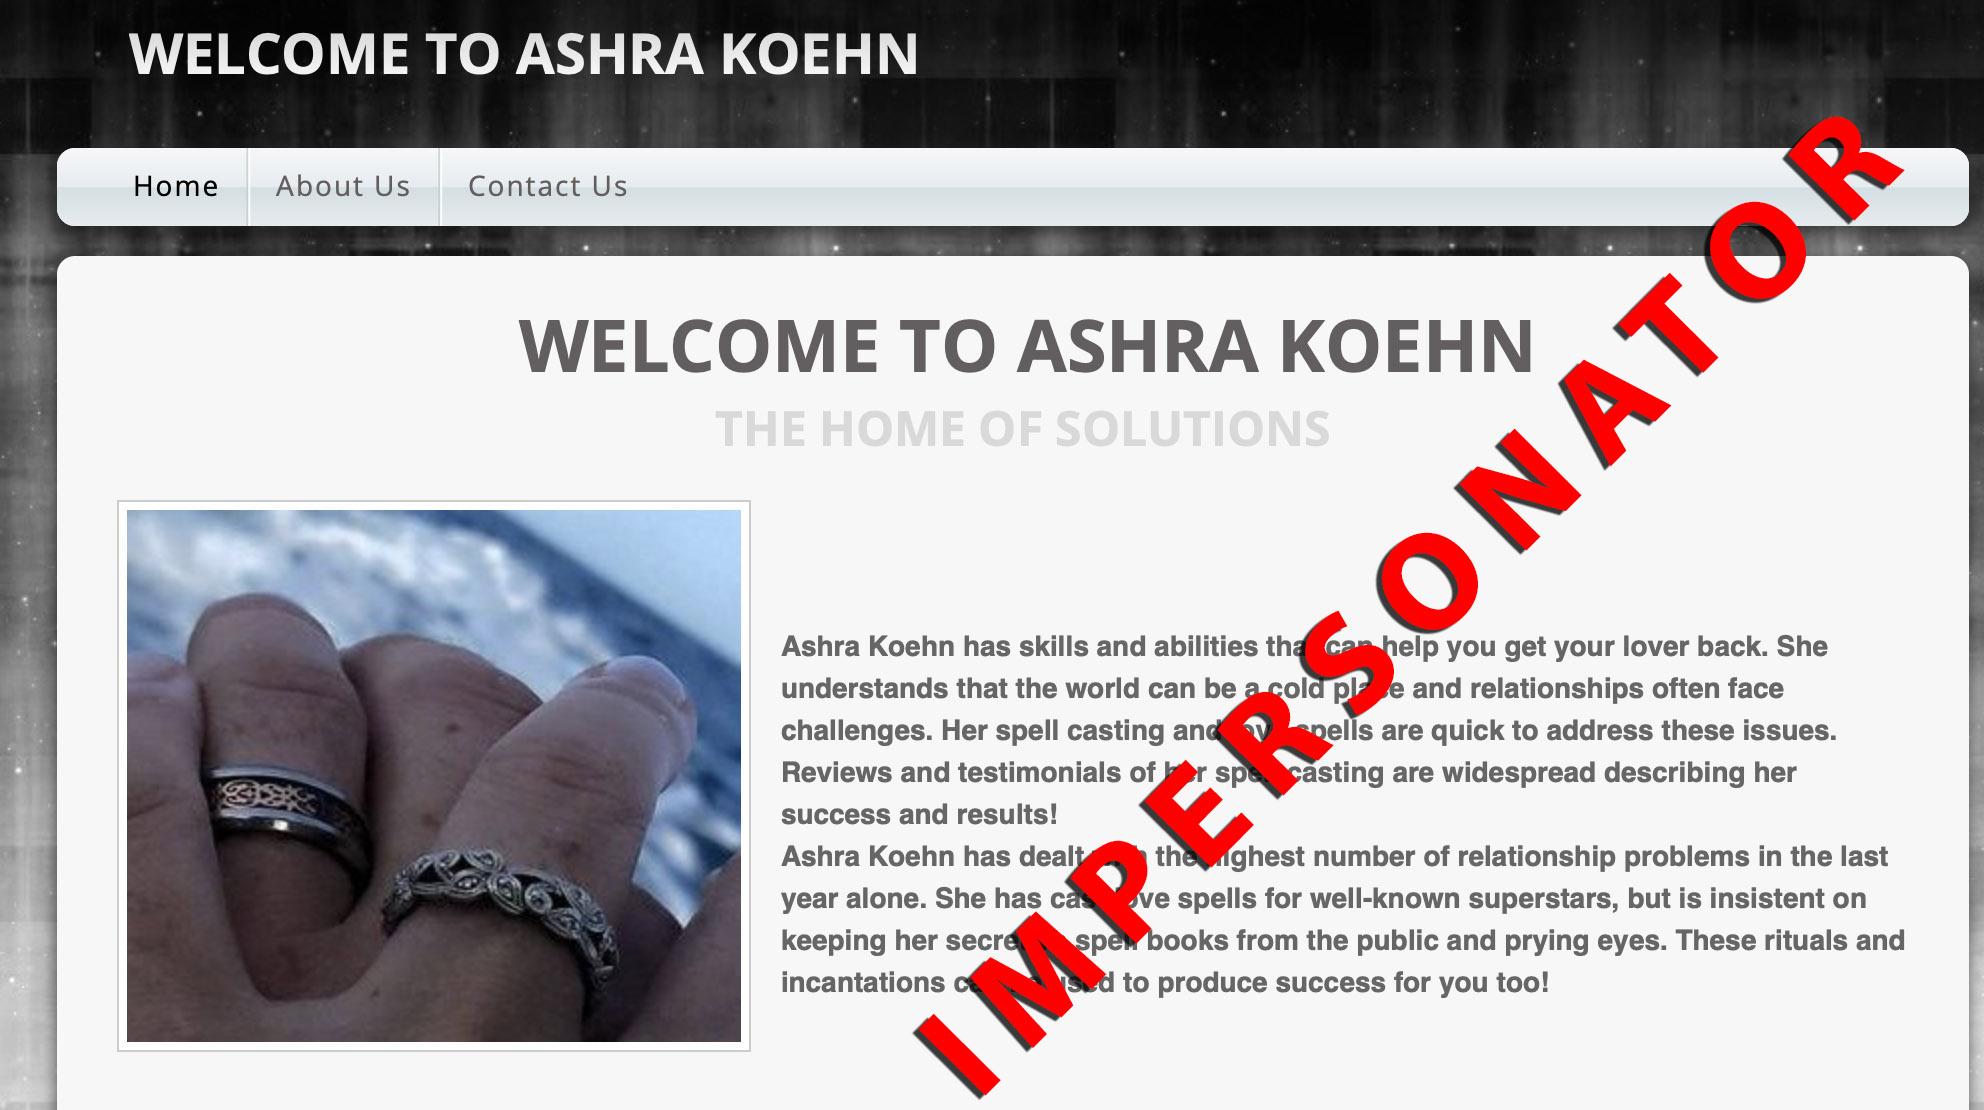 ashra-koehn-webs-impersonator.jpg